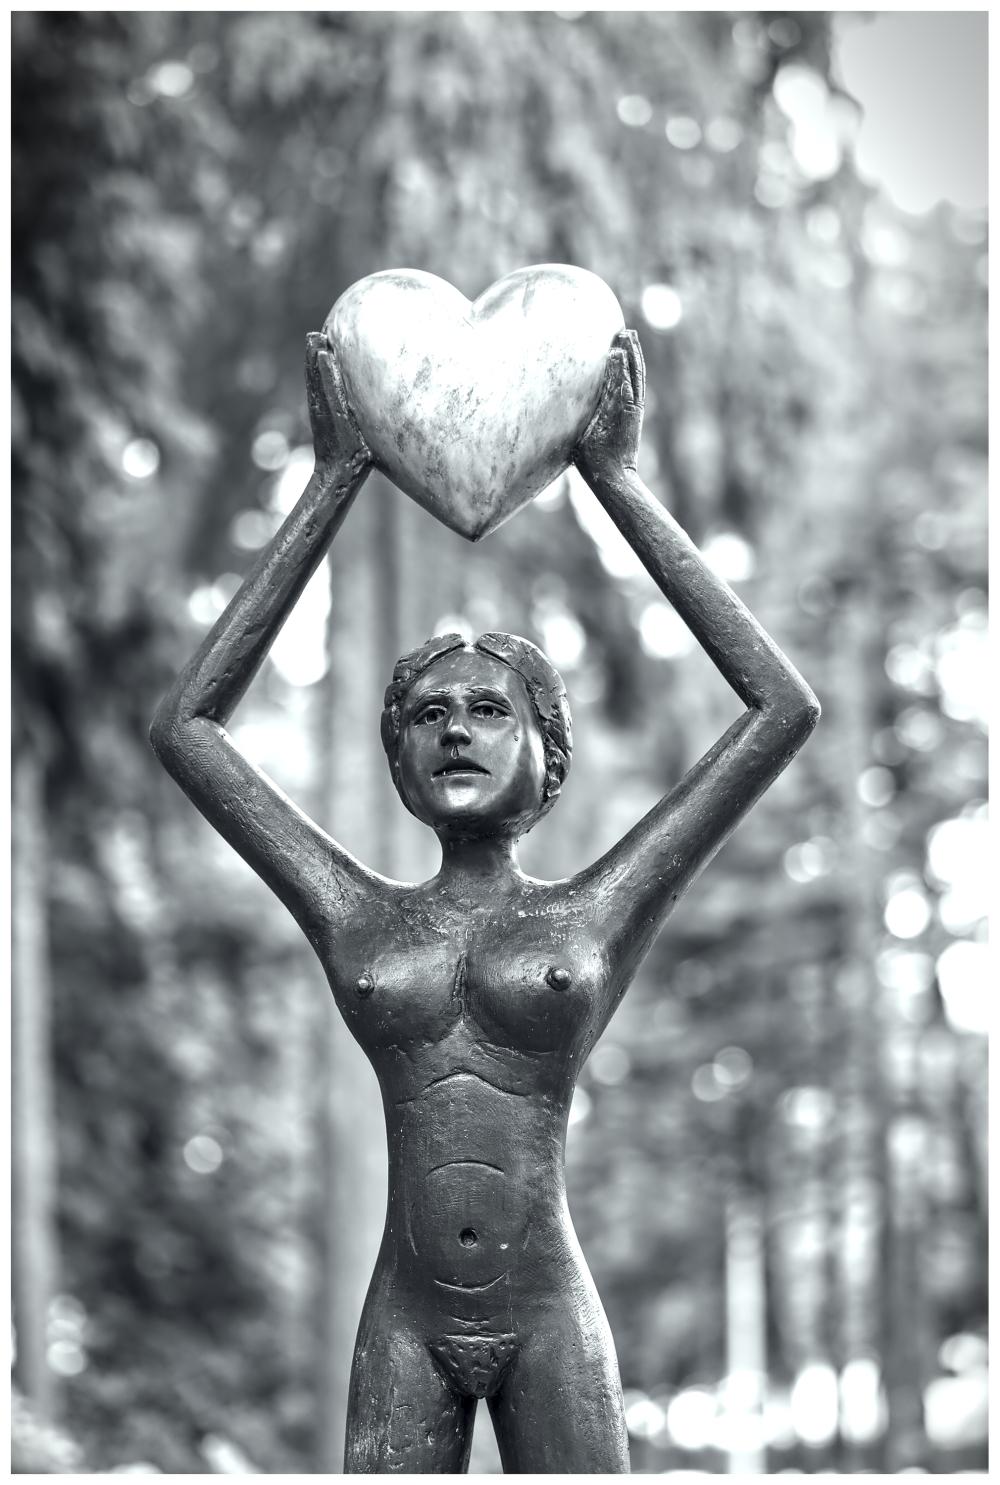 Estatua História Street Photography Guarda